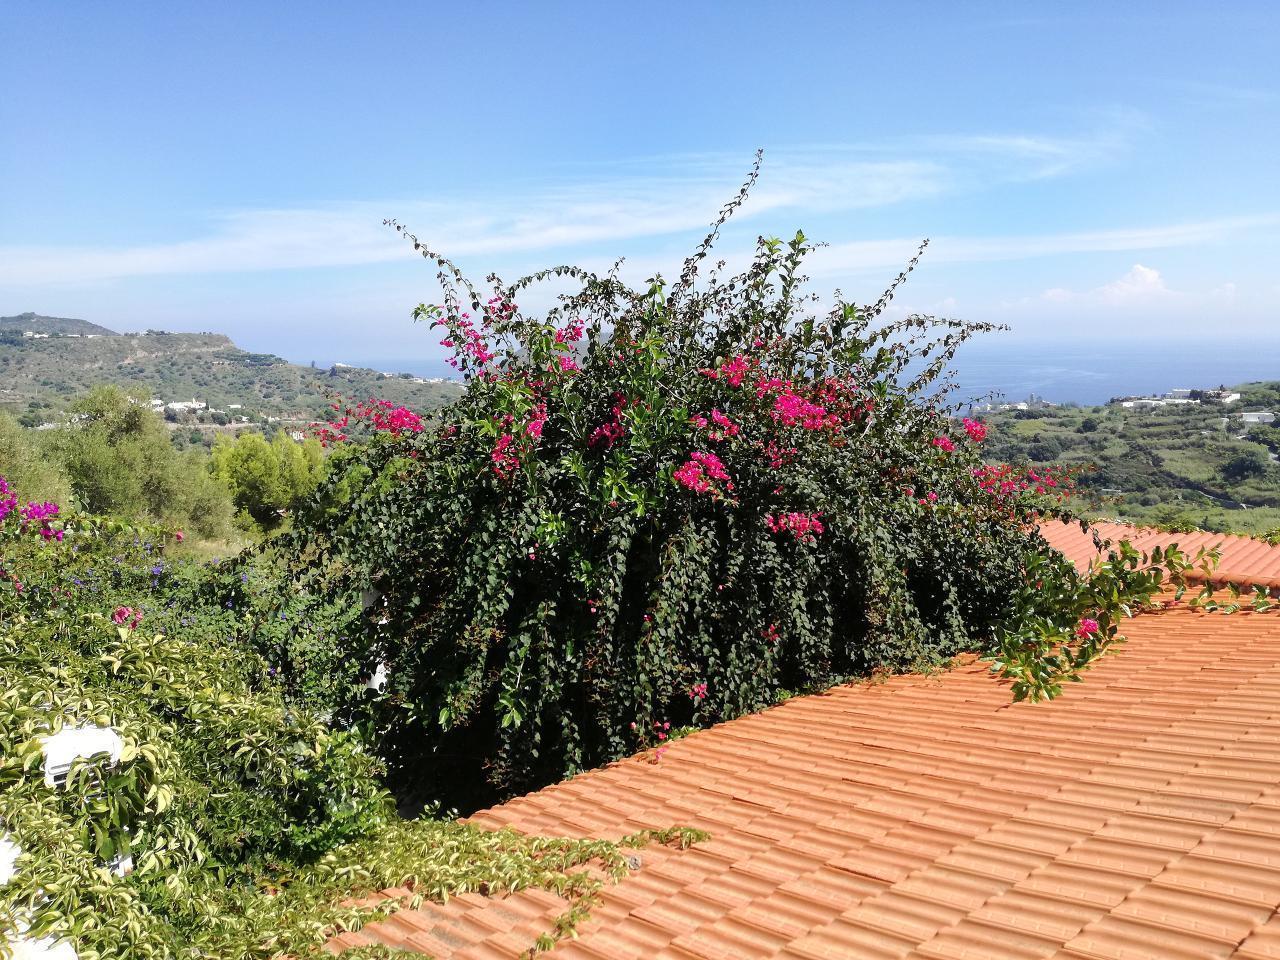 Maison de vacances Ferienhaushälfte Solandra auf sizilianischer Insel mit atemberaubenden Meeres-Rundblick (2038046), Lipari, Lipari, Sicile, Italie, image 47